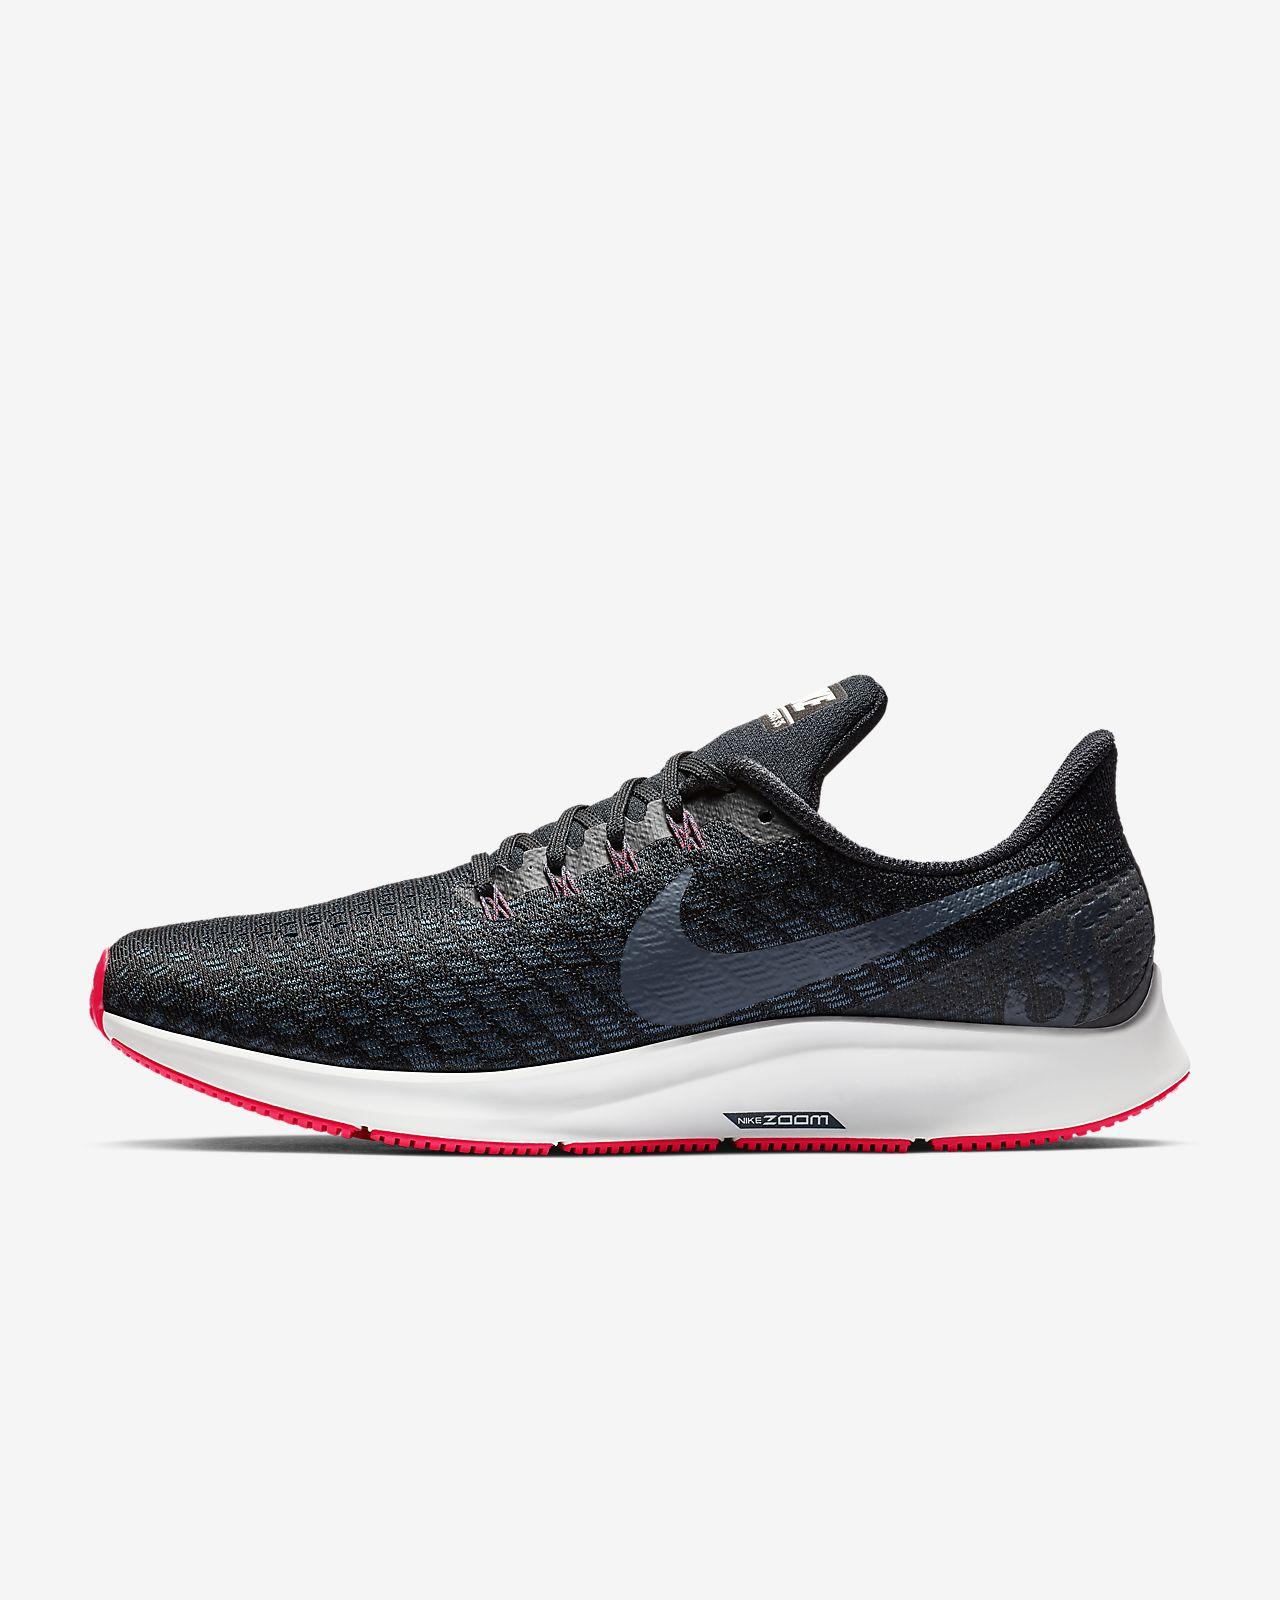 online store ec077 06cda ... Calzado de running para hombre Nike Air Zoom Pegasus 35